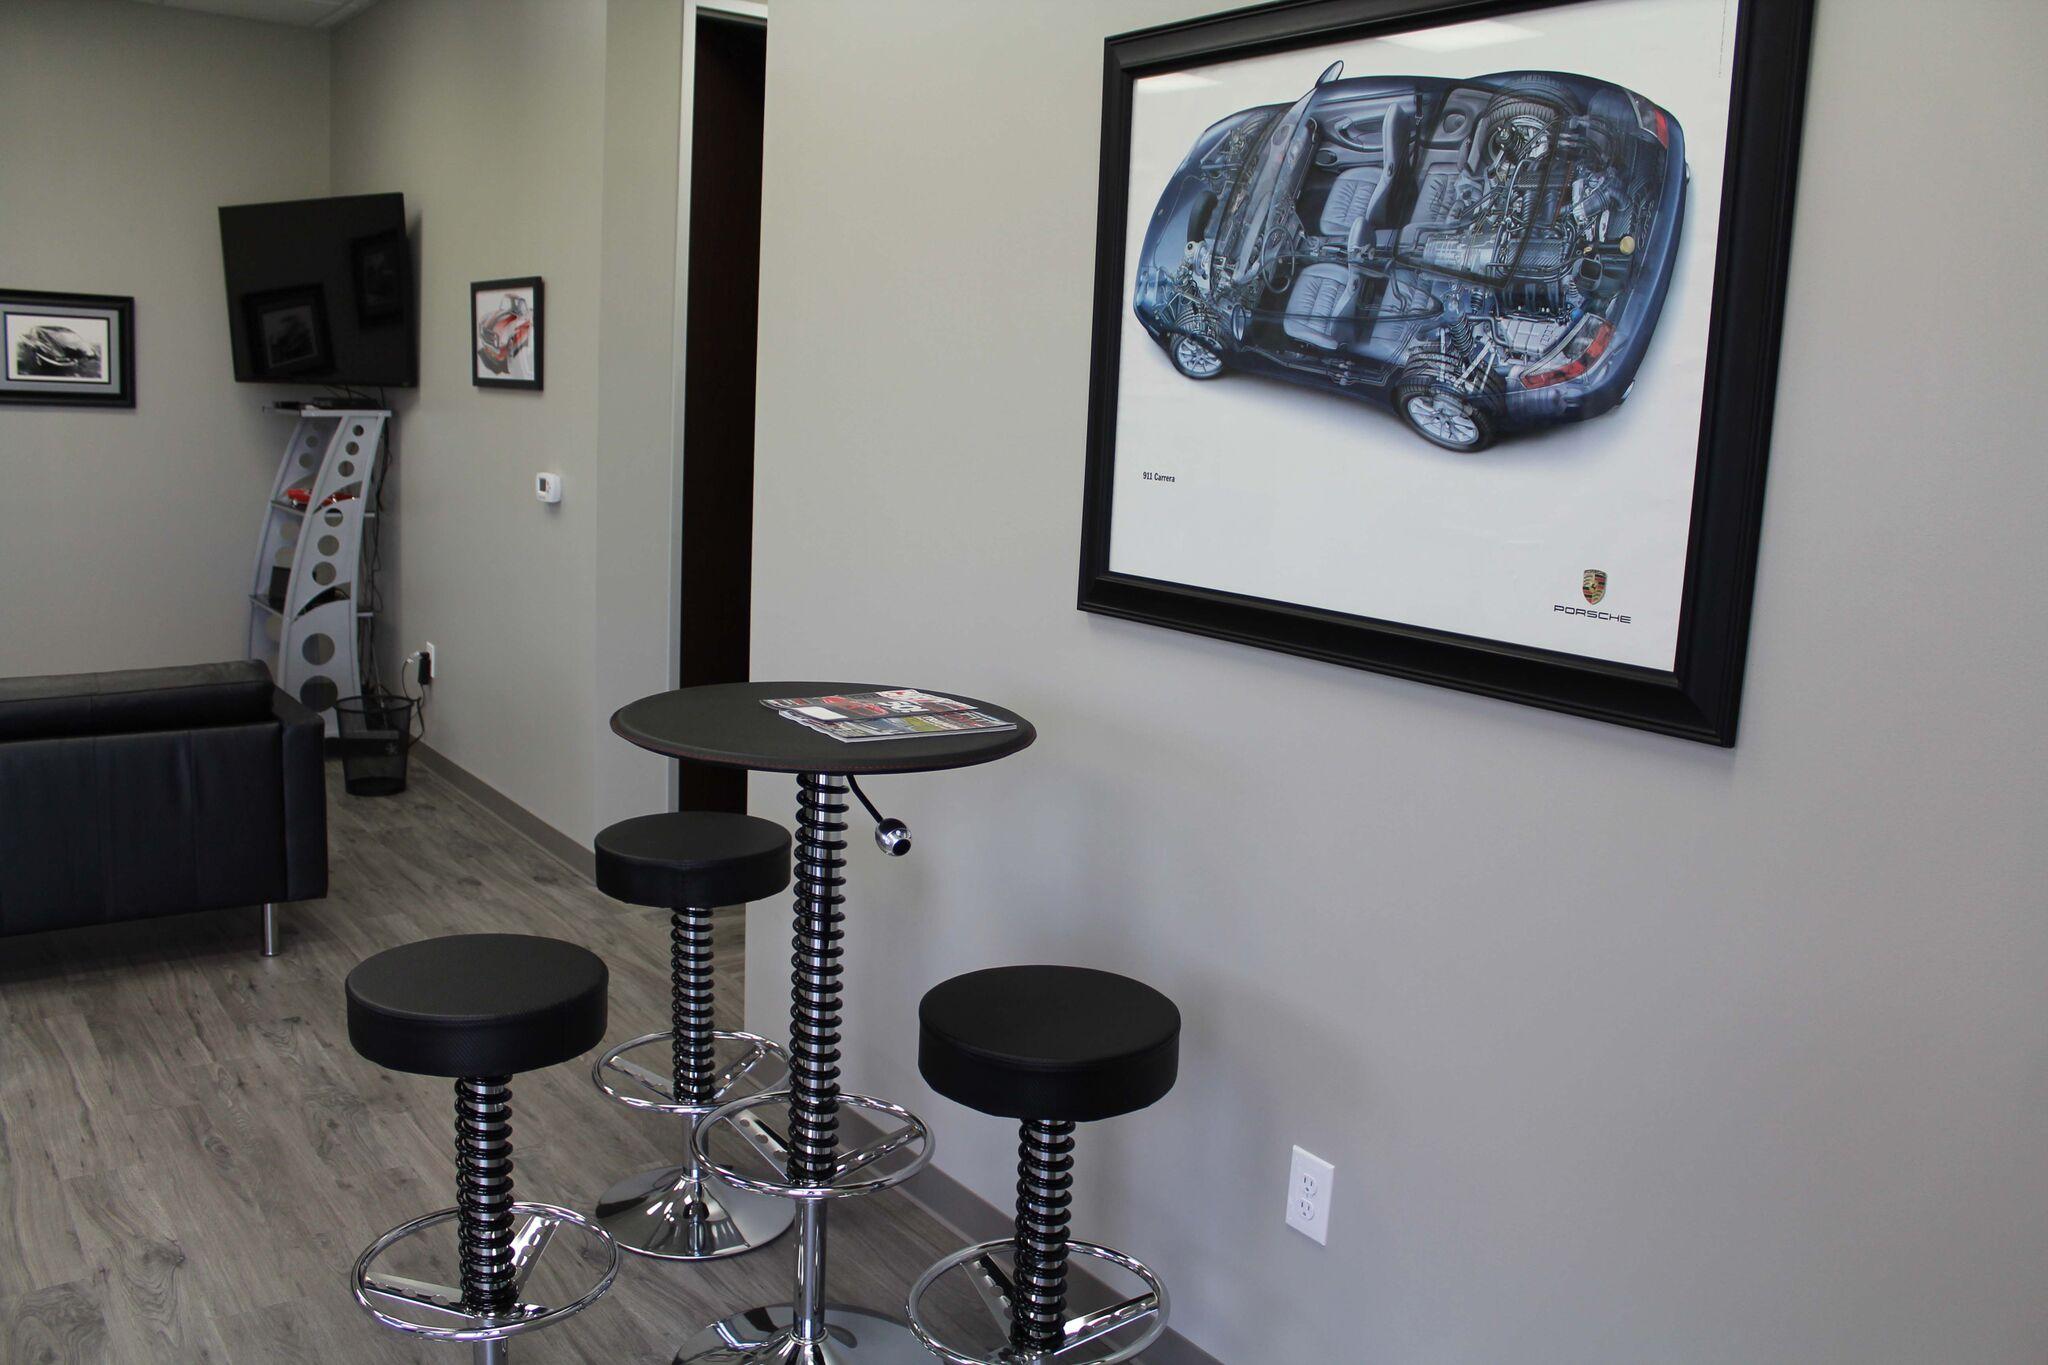 Porsche Picture